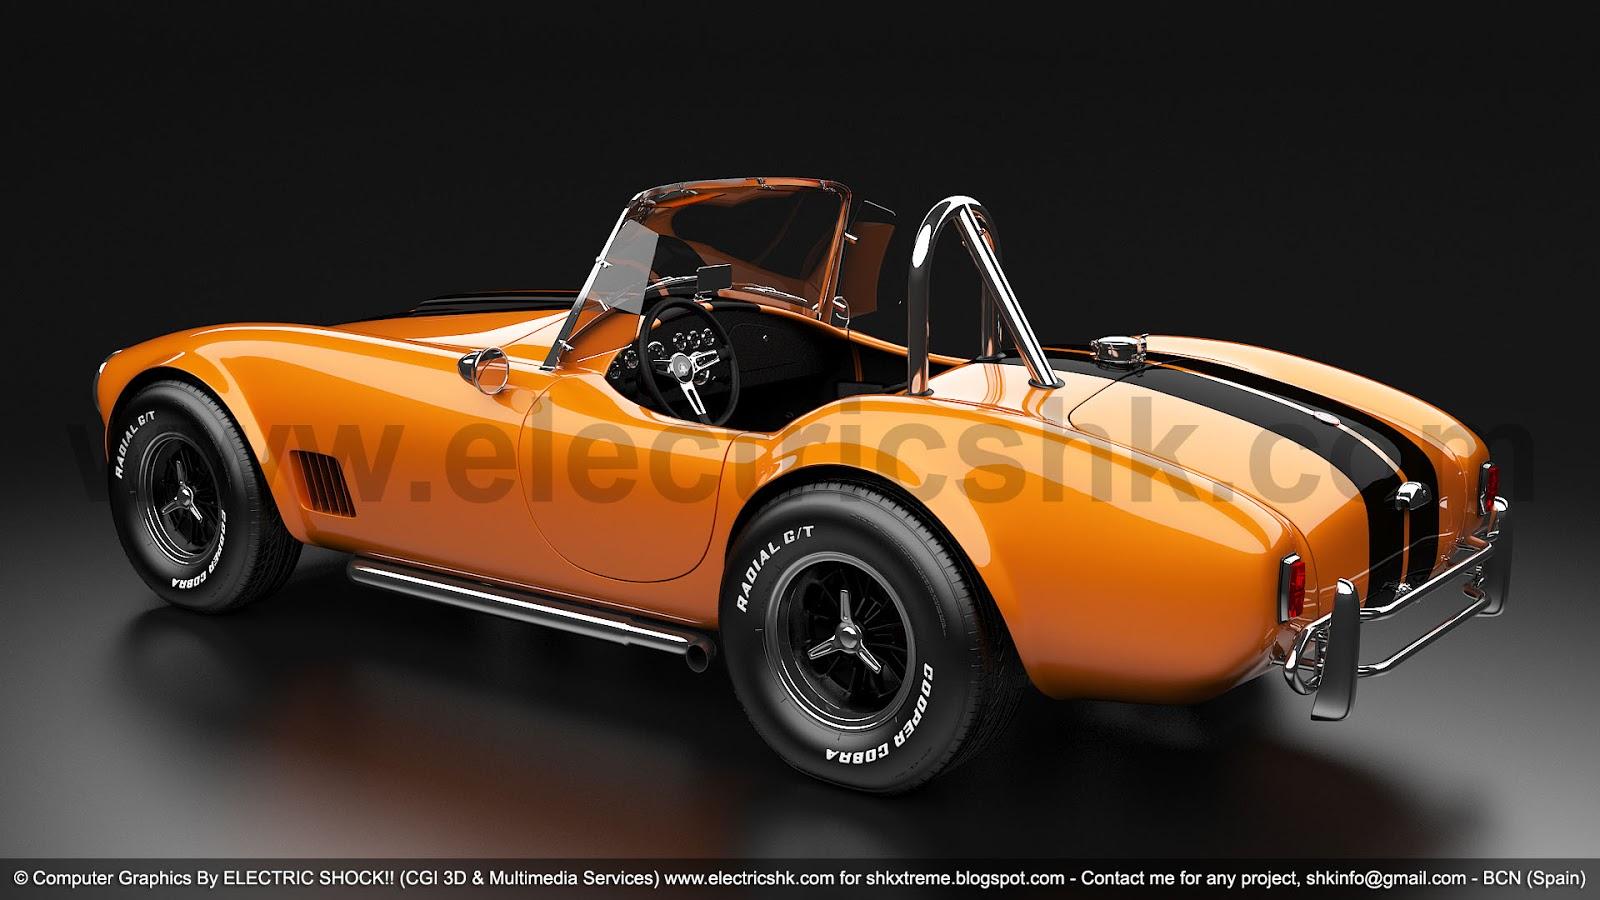 Shelby AC Cobra amarillo y negro vista completa trasera lateral